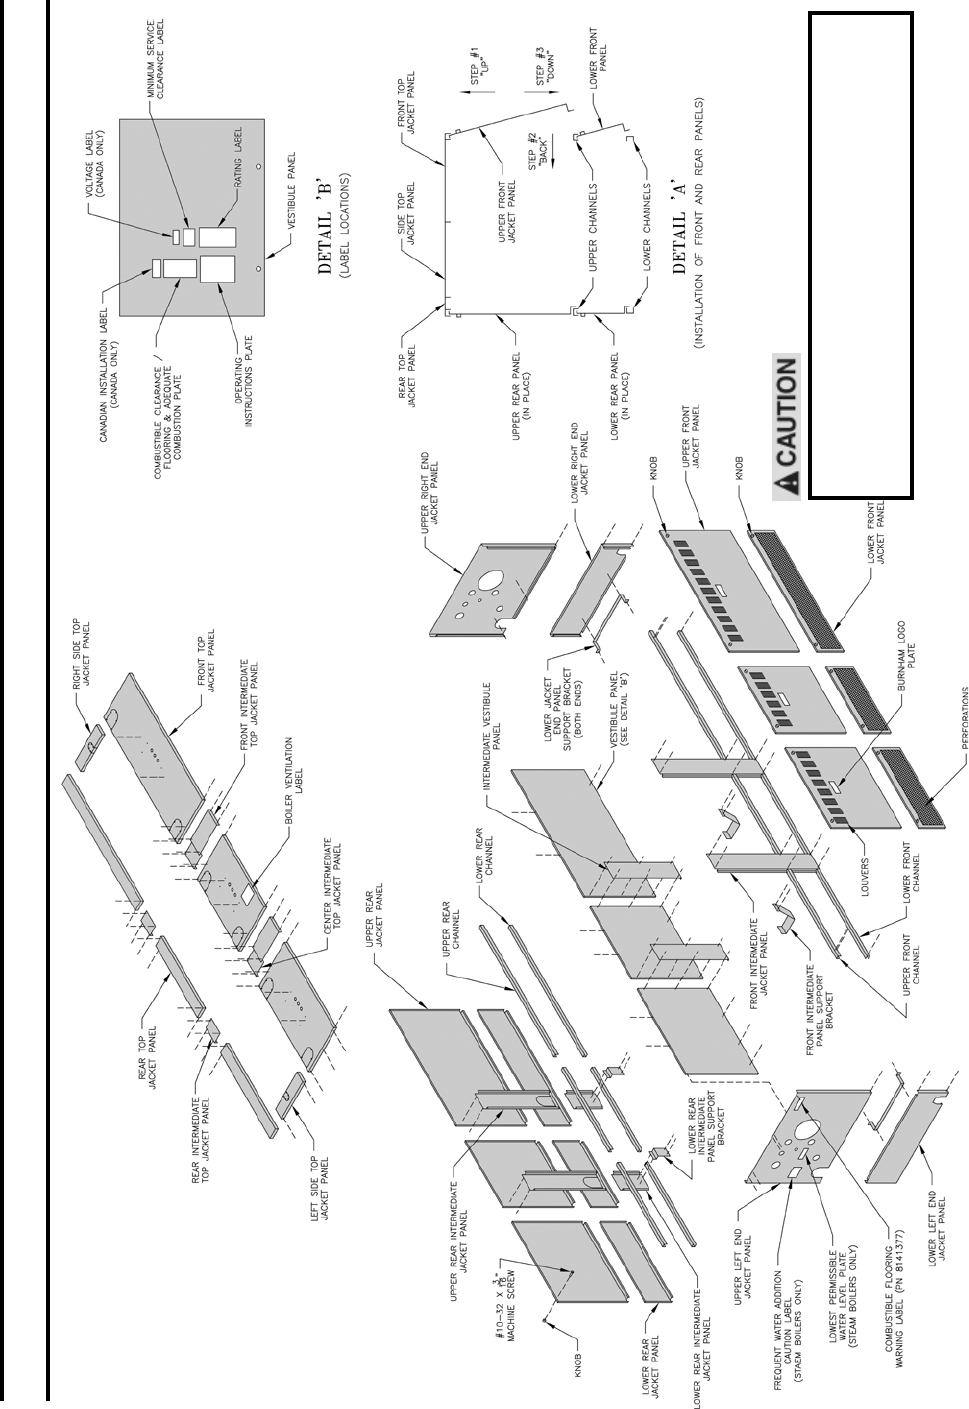 Pvg Burnham Gas Boilers Wiring Diagram For Light Fuel Oil Furnace Diagrams Series 5b Boiler Installation Operating Instructions Rh Usermanual Wiki Basic